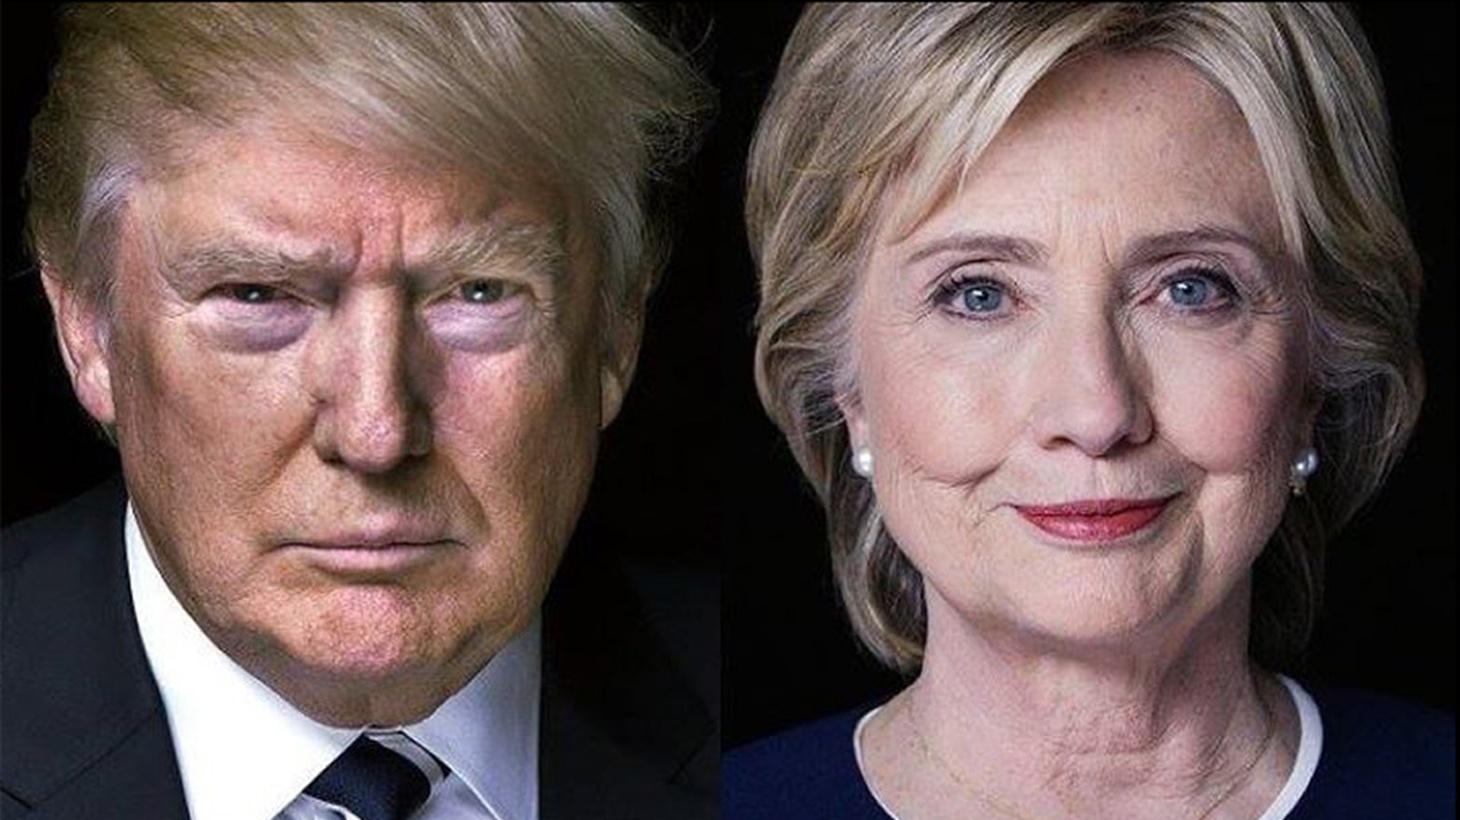 Hillary Clinton and Donald Trump's final debate.